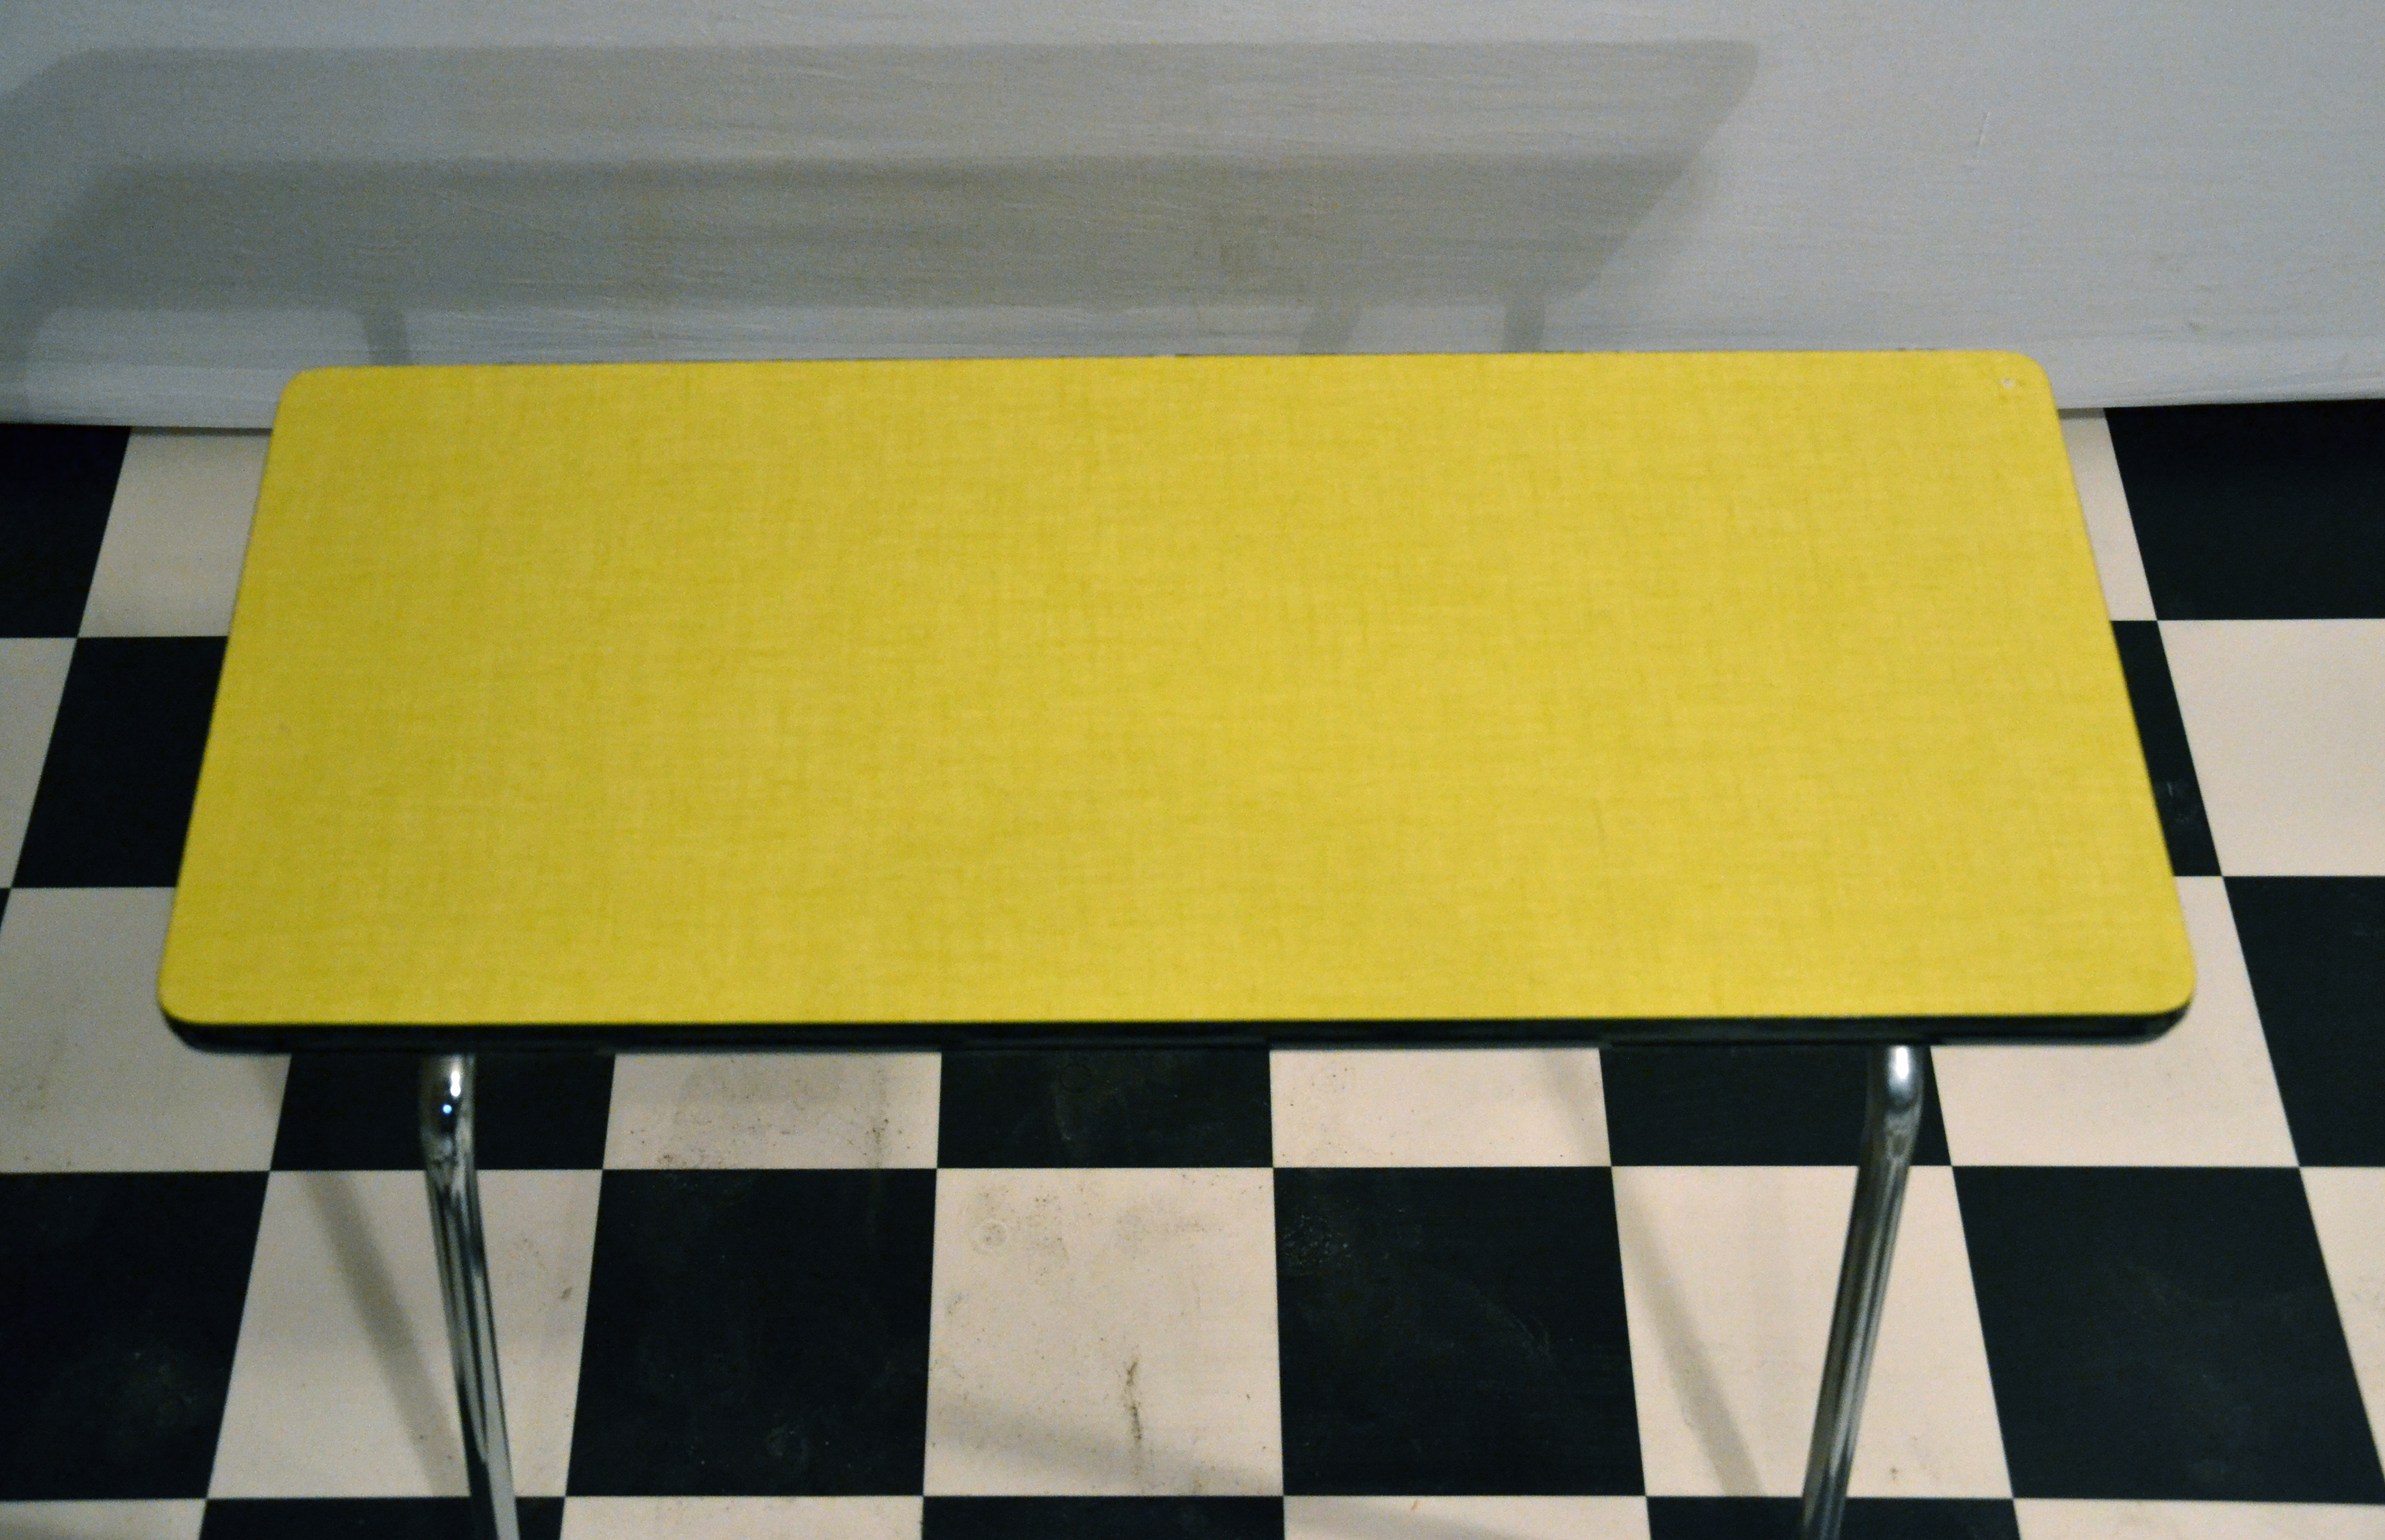 table basse formica mobilier design d coration d 39 int rieur. Black Bedroom Furniture Sets. Home Design Ideas